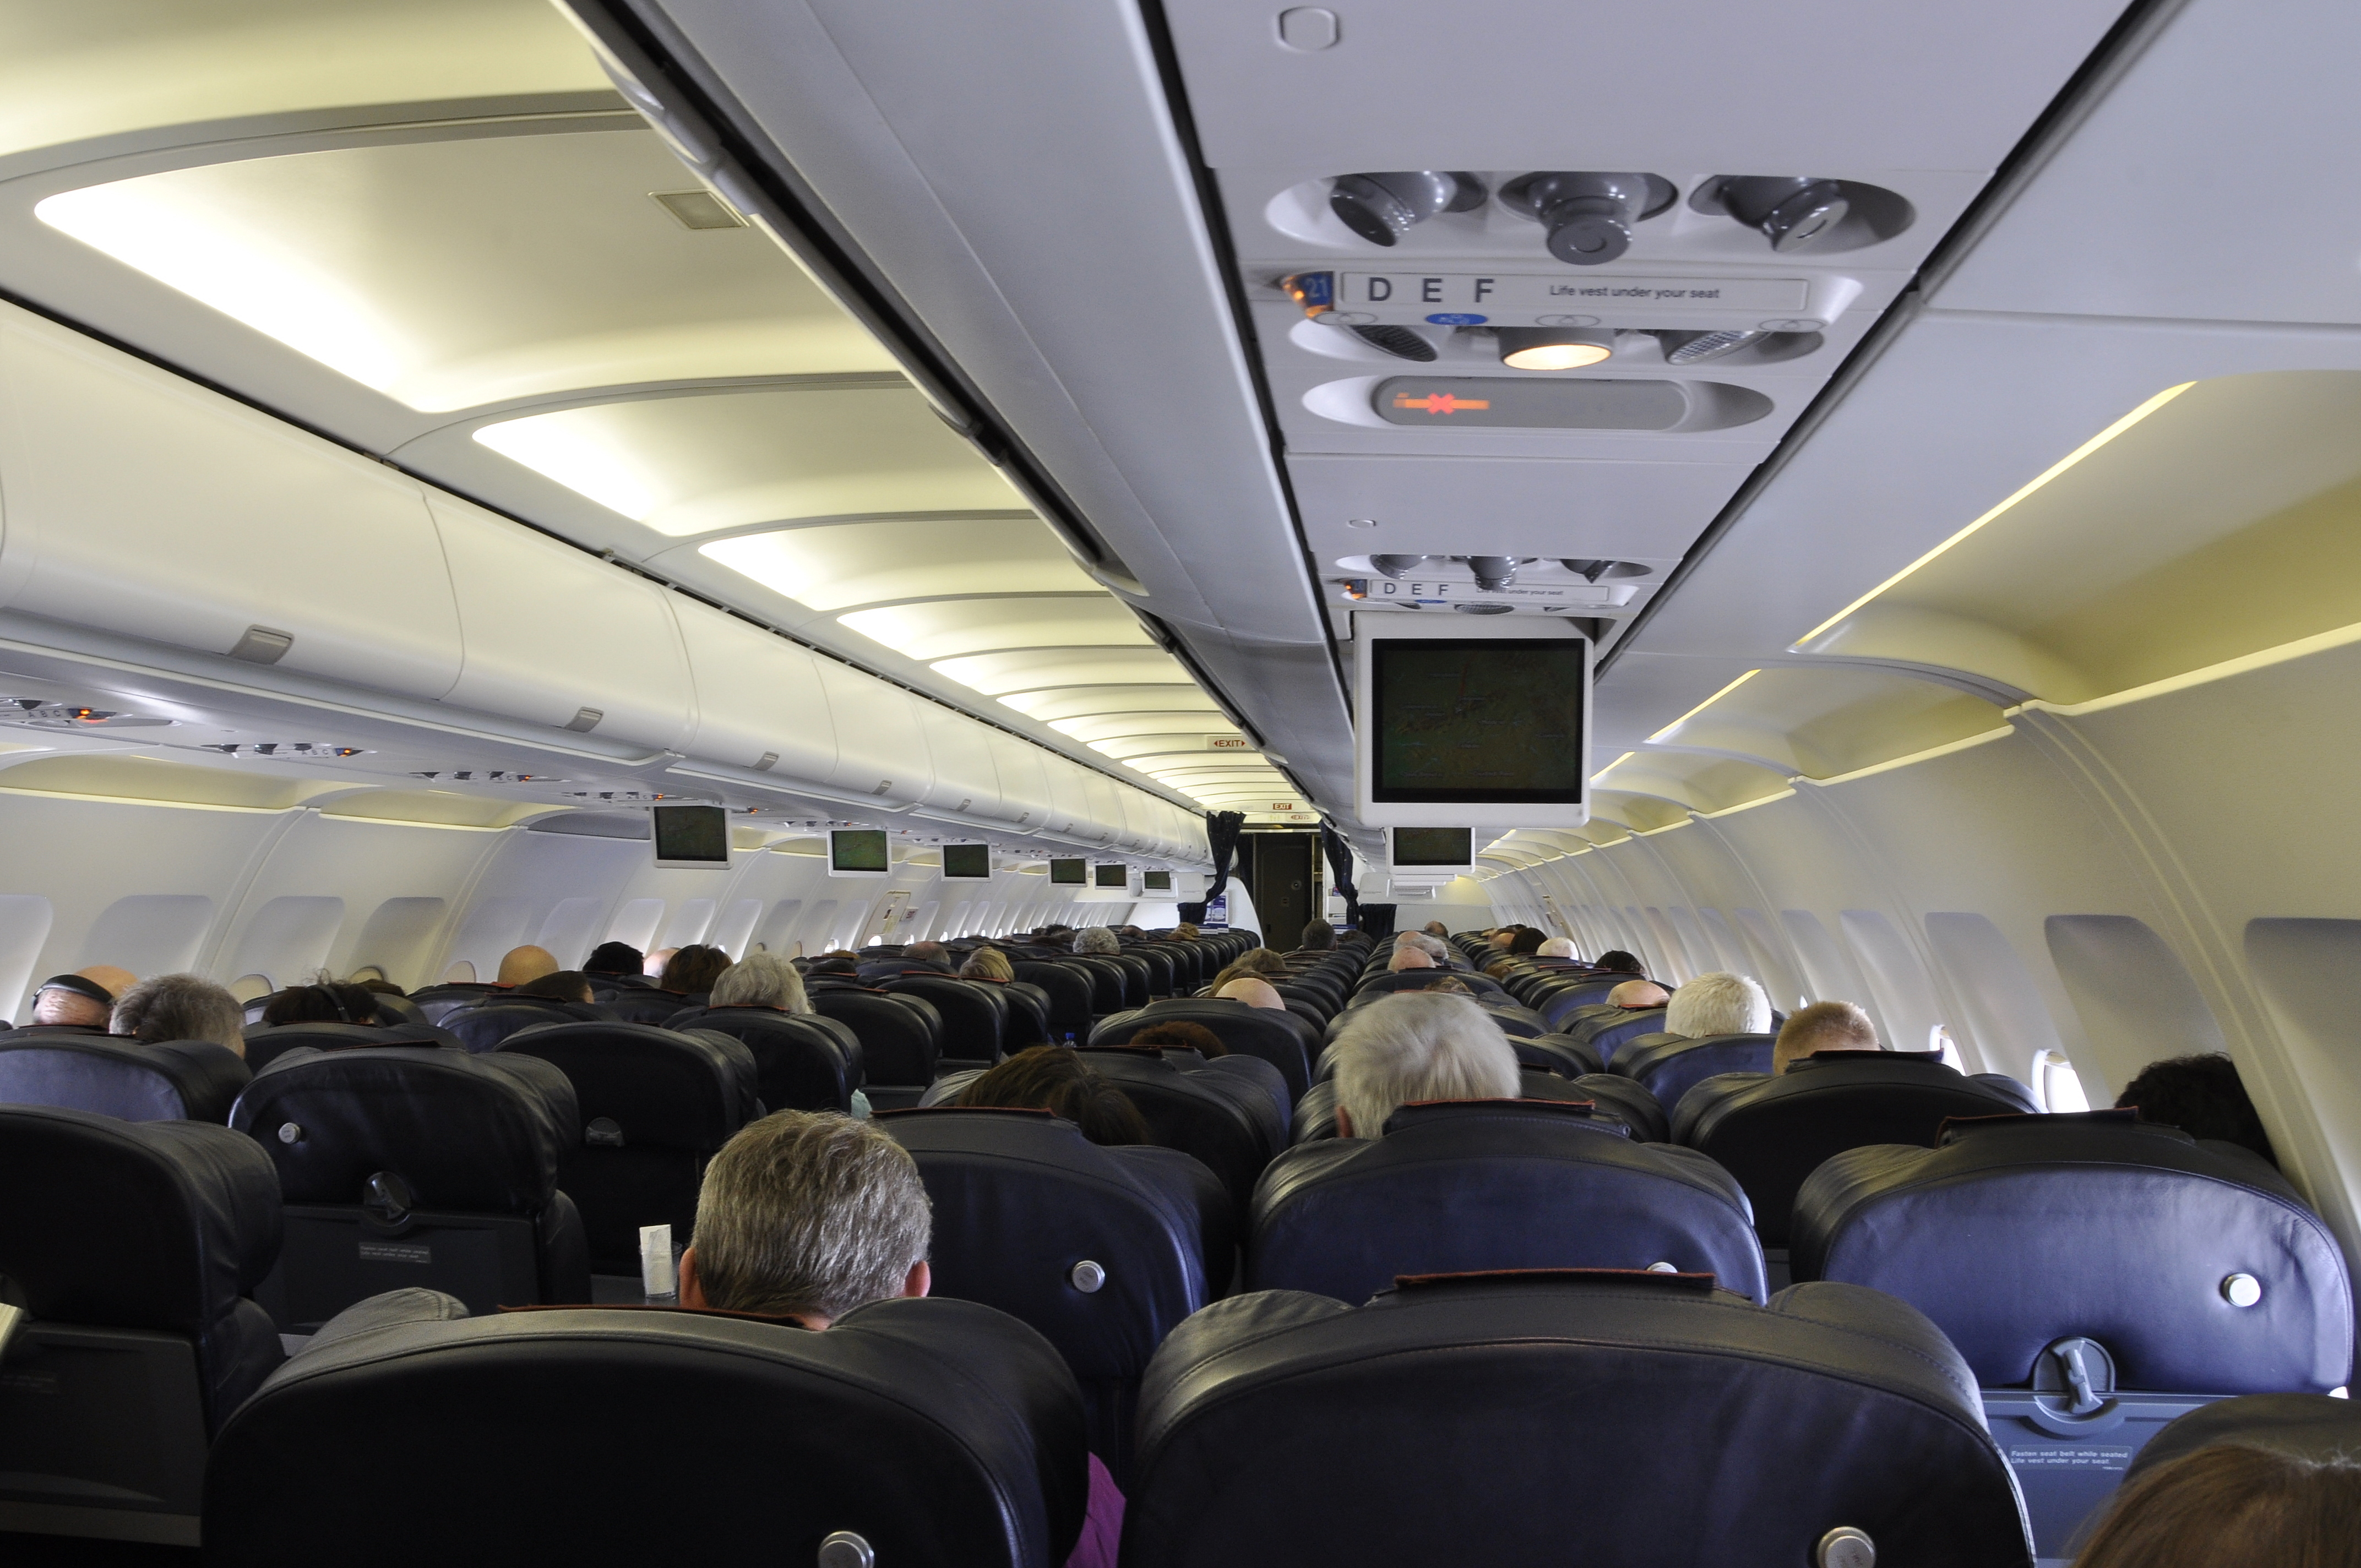 File:Airbus 319 15-03-2011 13-38-08.JPG - Wikimedia Commons